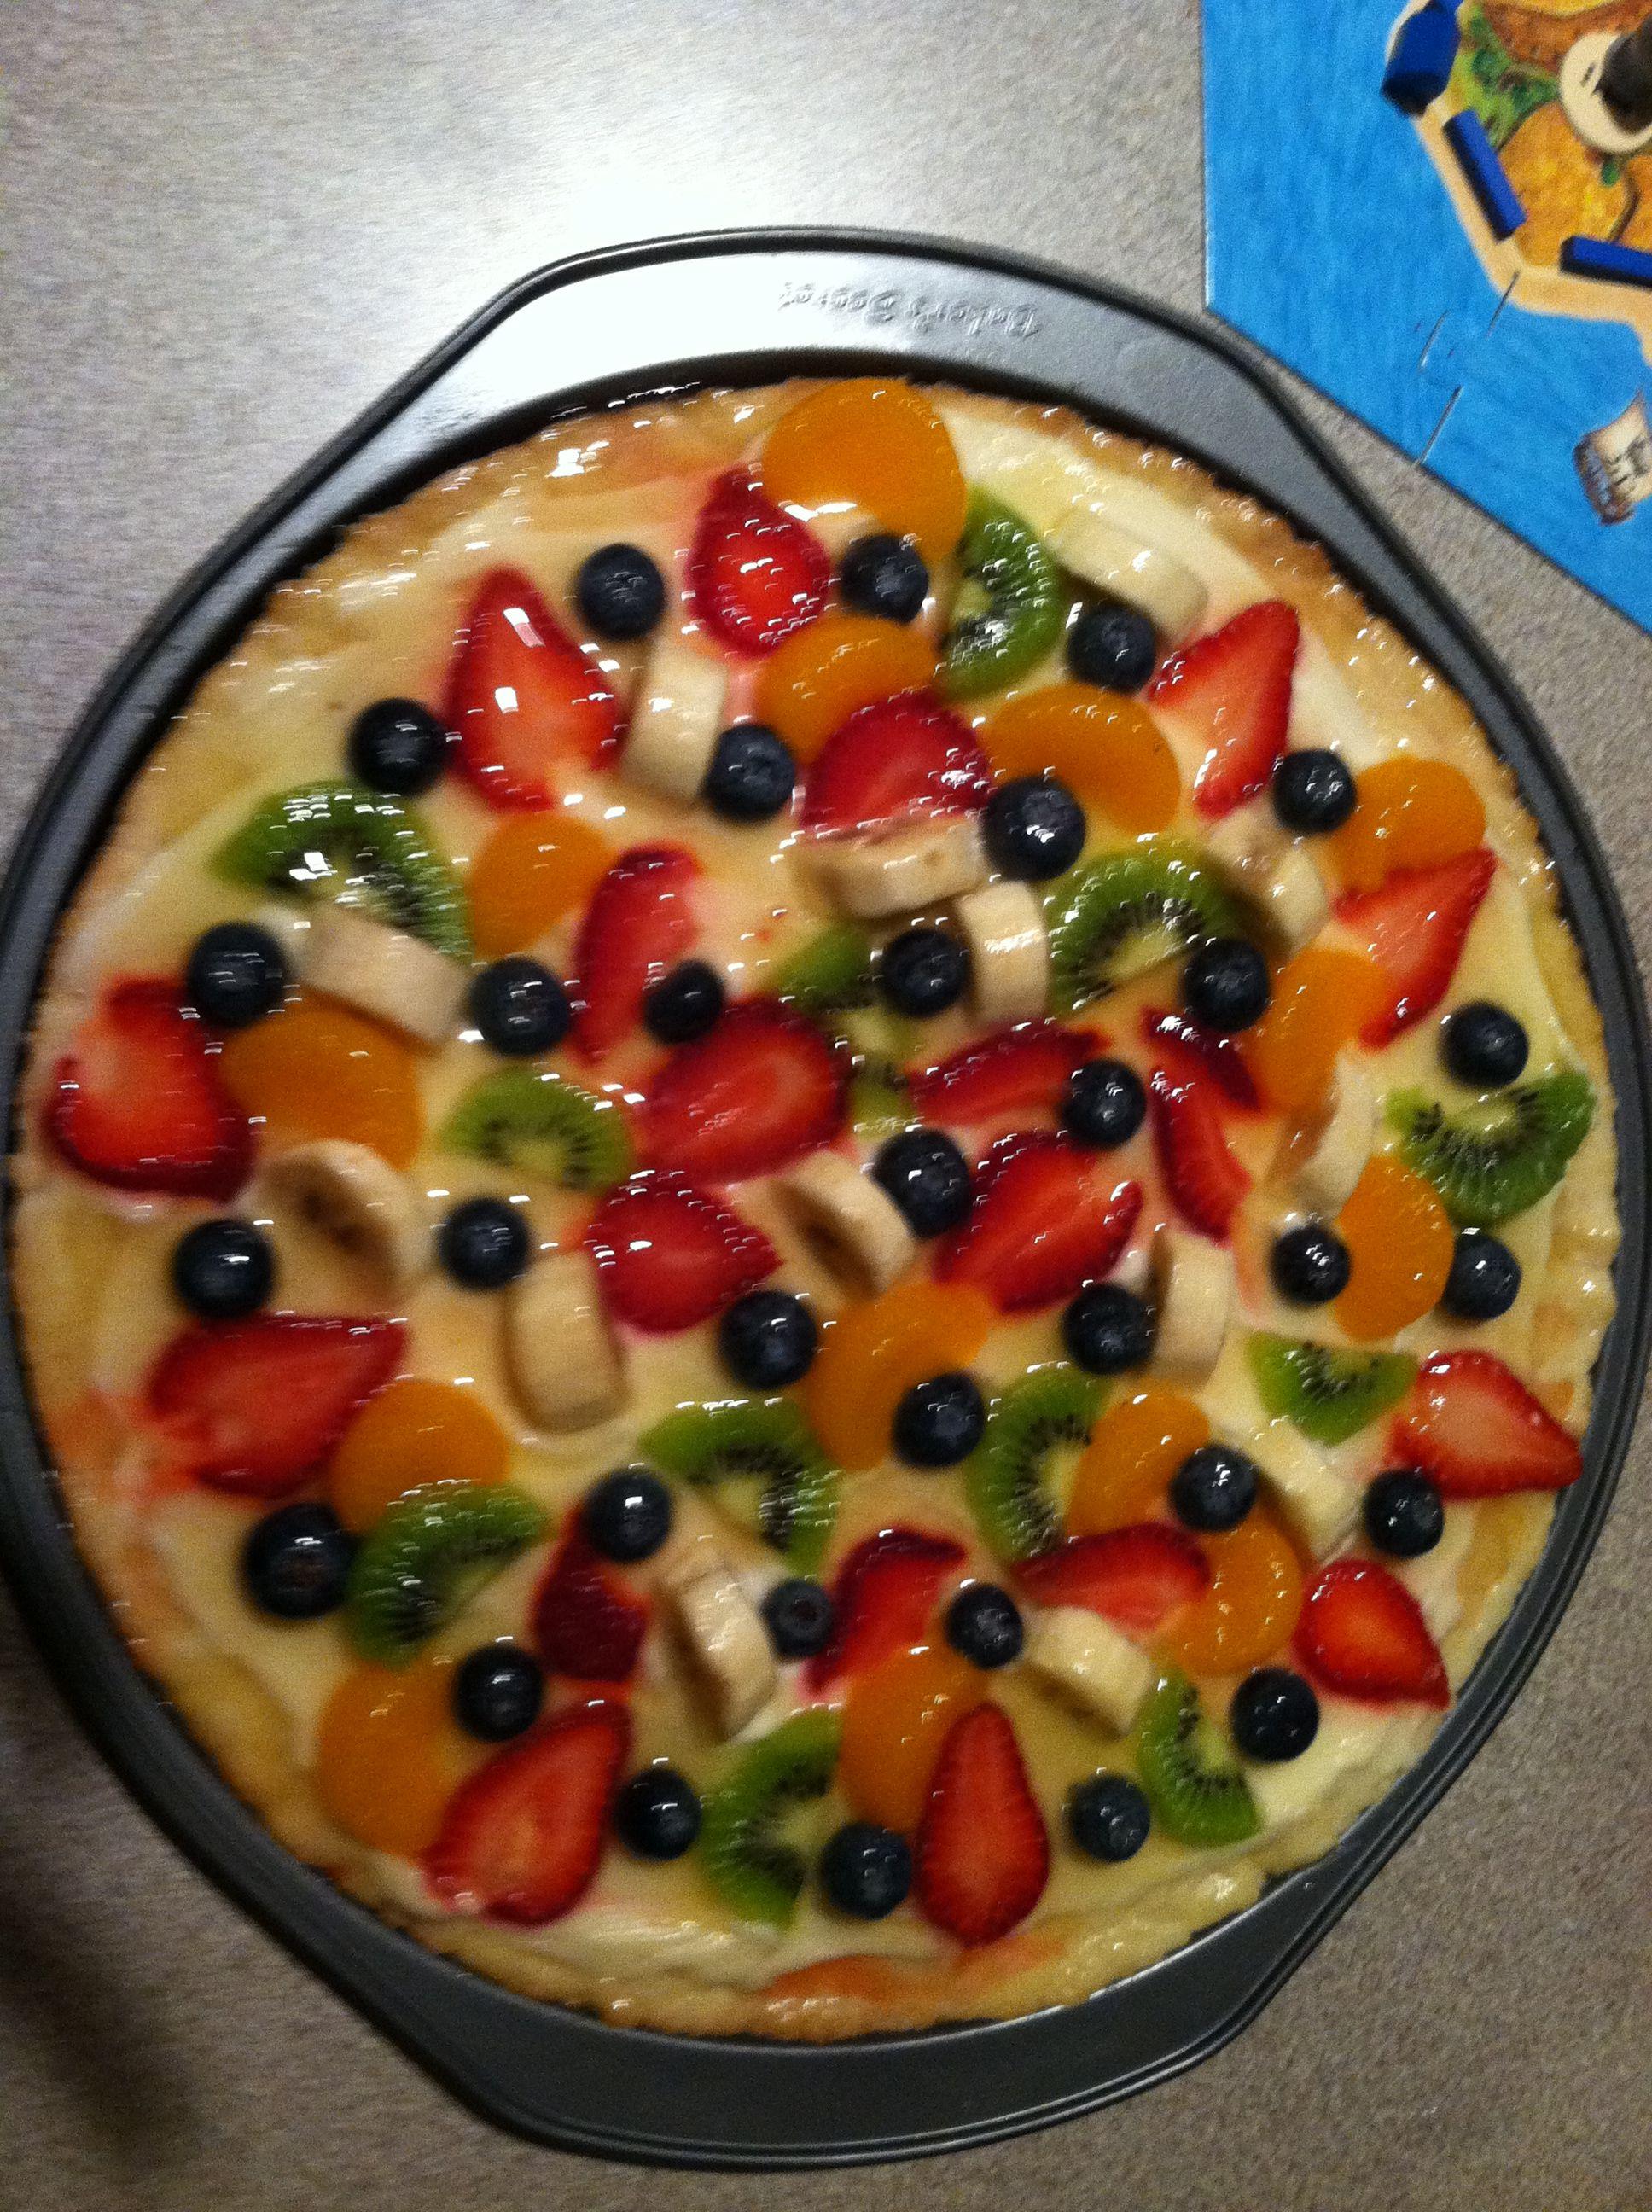 ... pizza pizza season i ng fruit salsa fruit wands fruit pizza 1 thumb